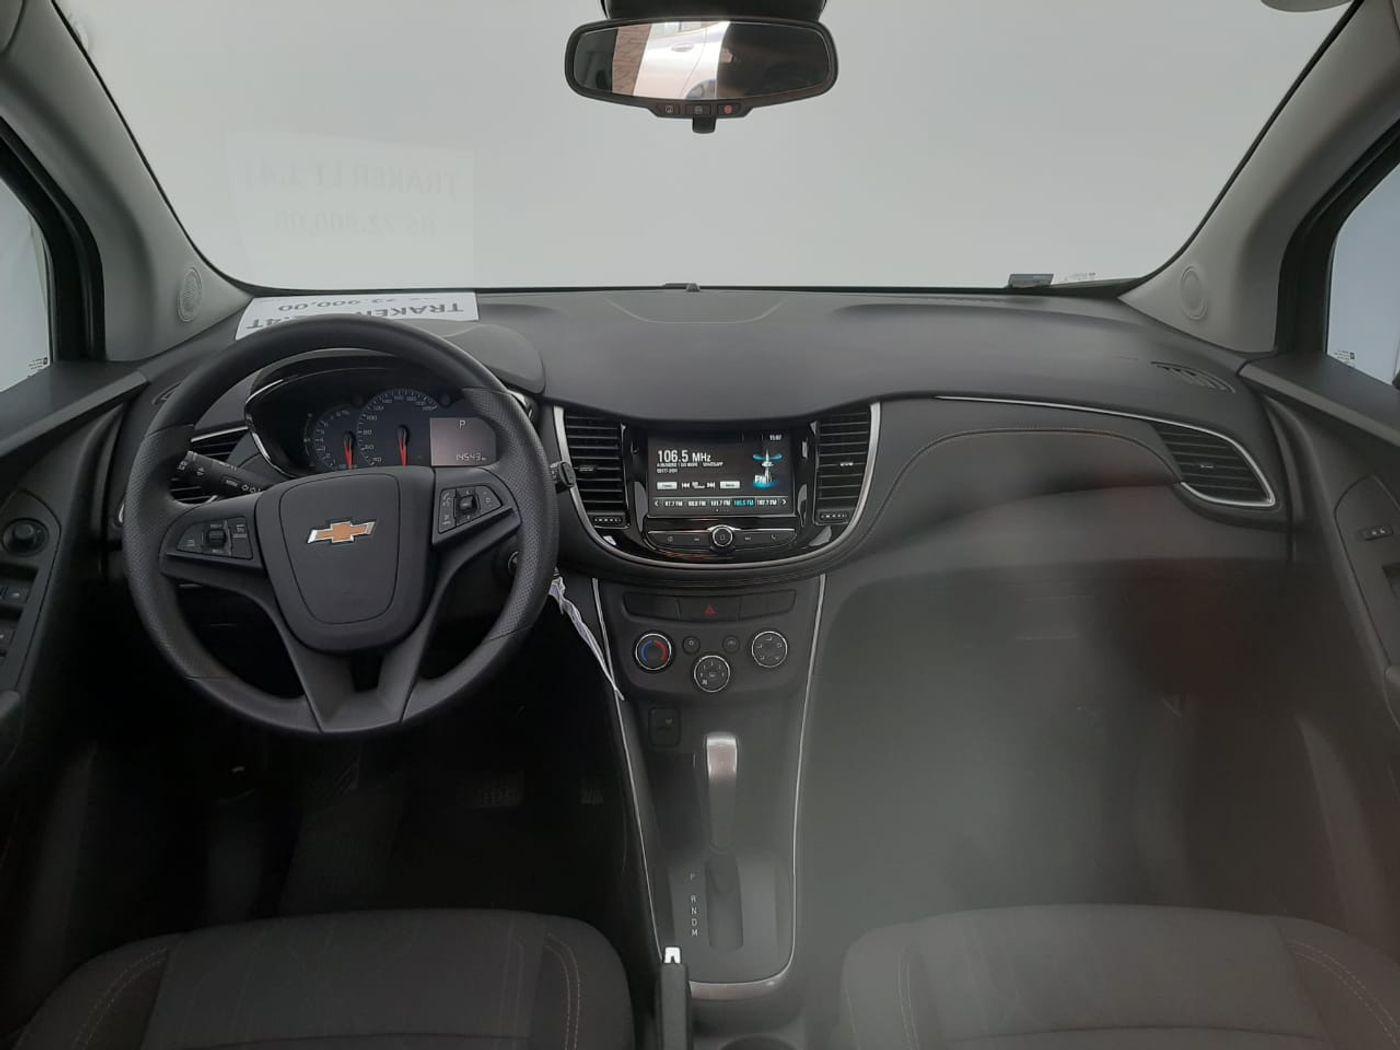 Chevrolet TRACKER LT 1.4 Turbo 16V Flex 4x2 Aut.